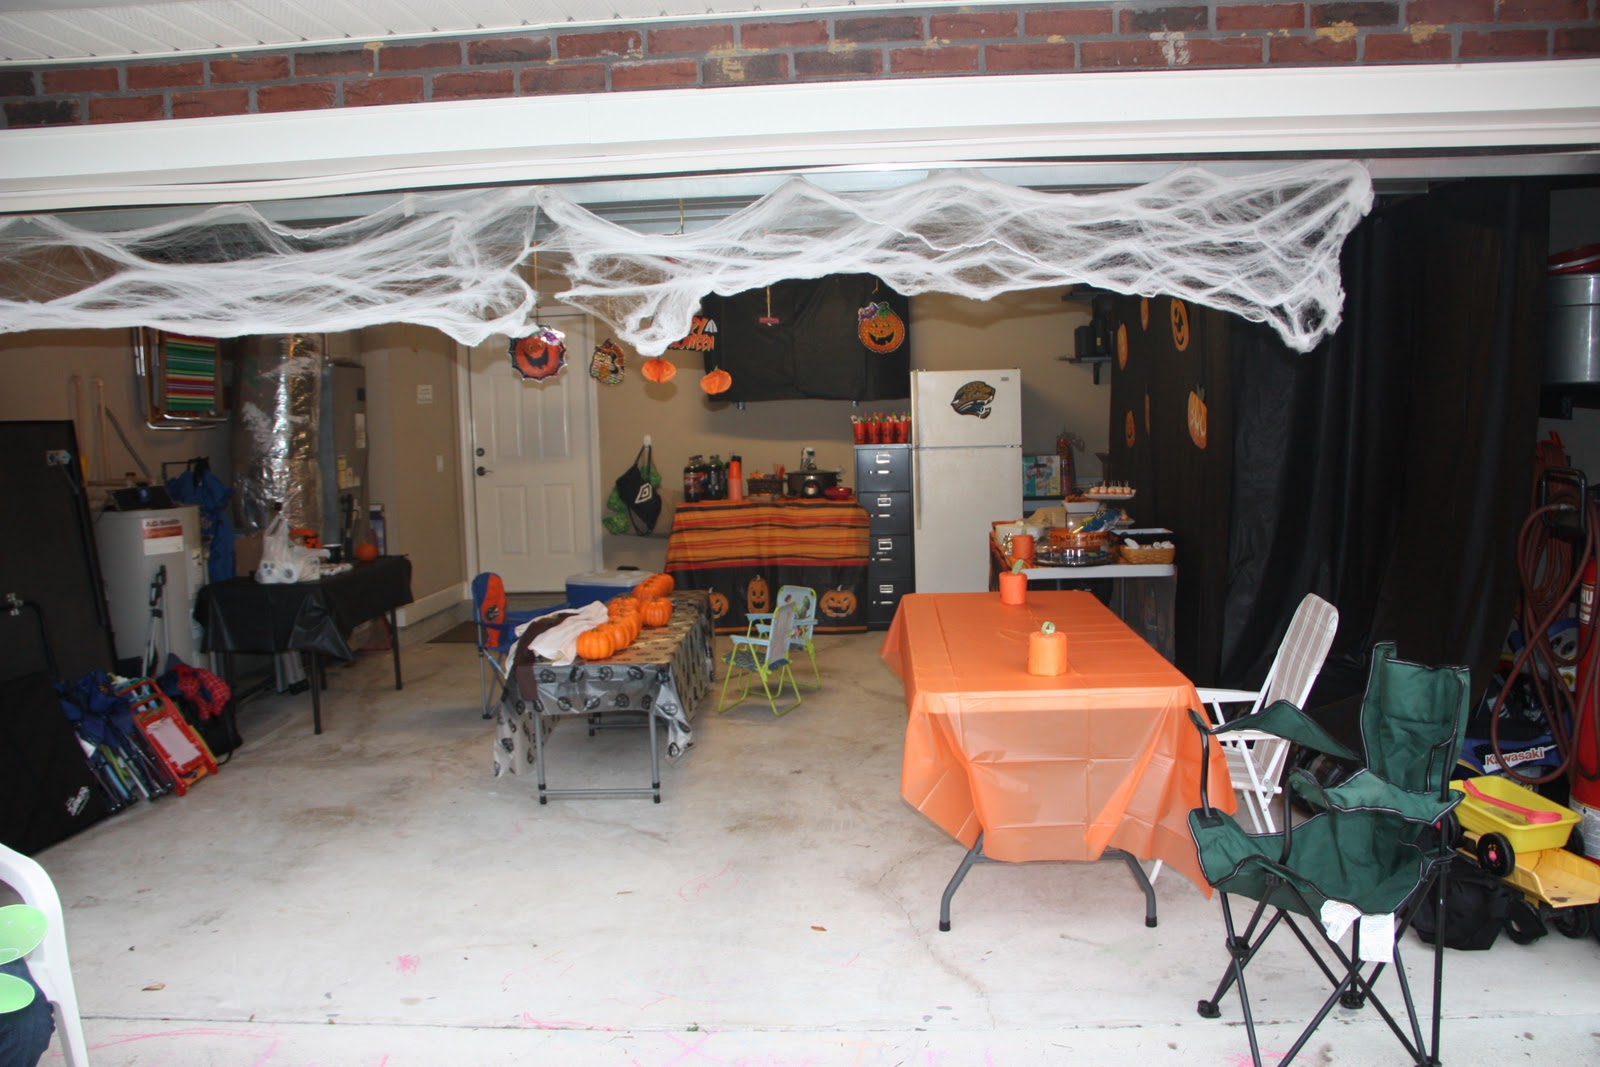 Garage Party Ideas - Home Design Inside on Garage Decoration  id=51598